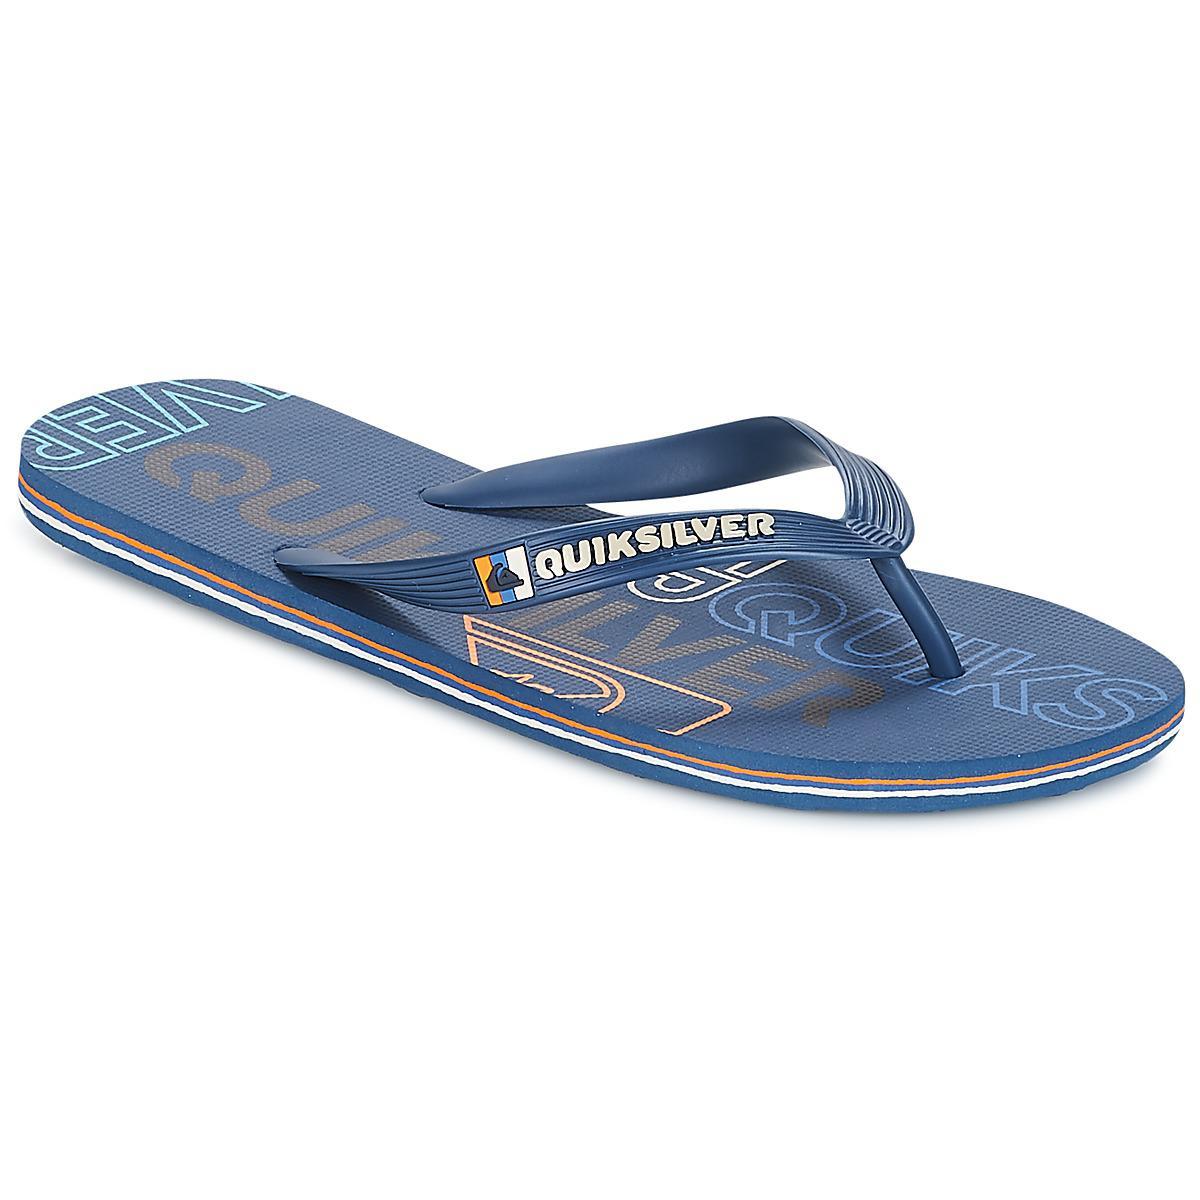 fa55cea80ff Quiksilver Molokai Nitro M Sndl Xbbb Men s Flip Flops   Sandals ...